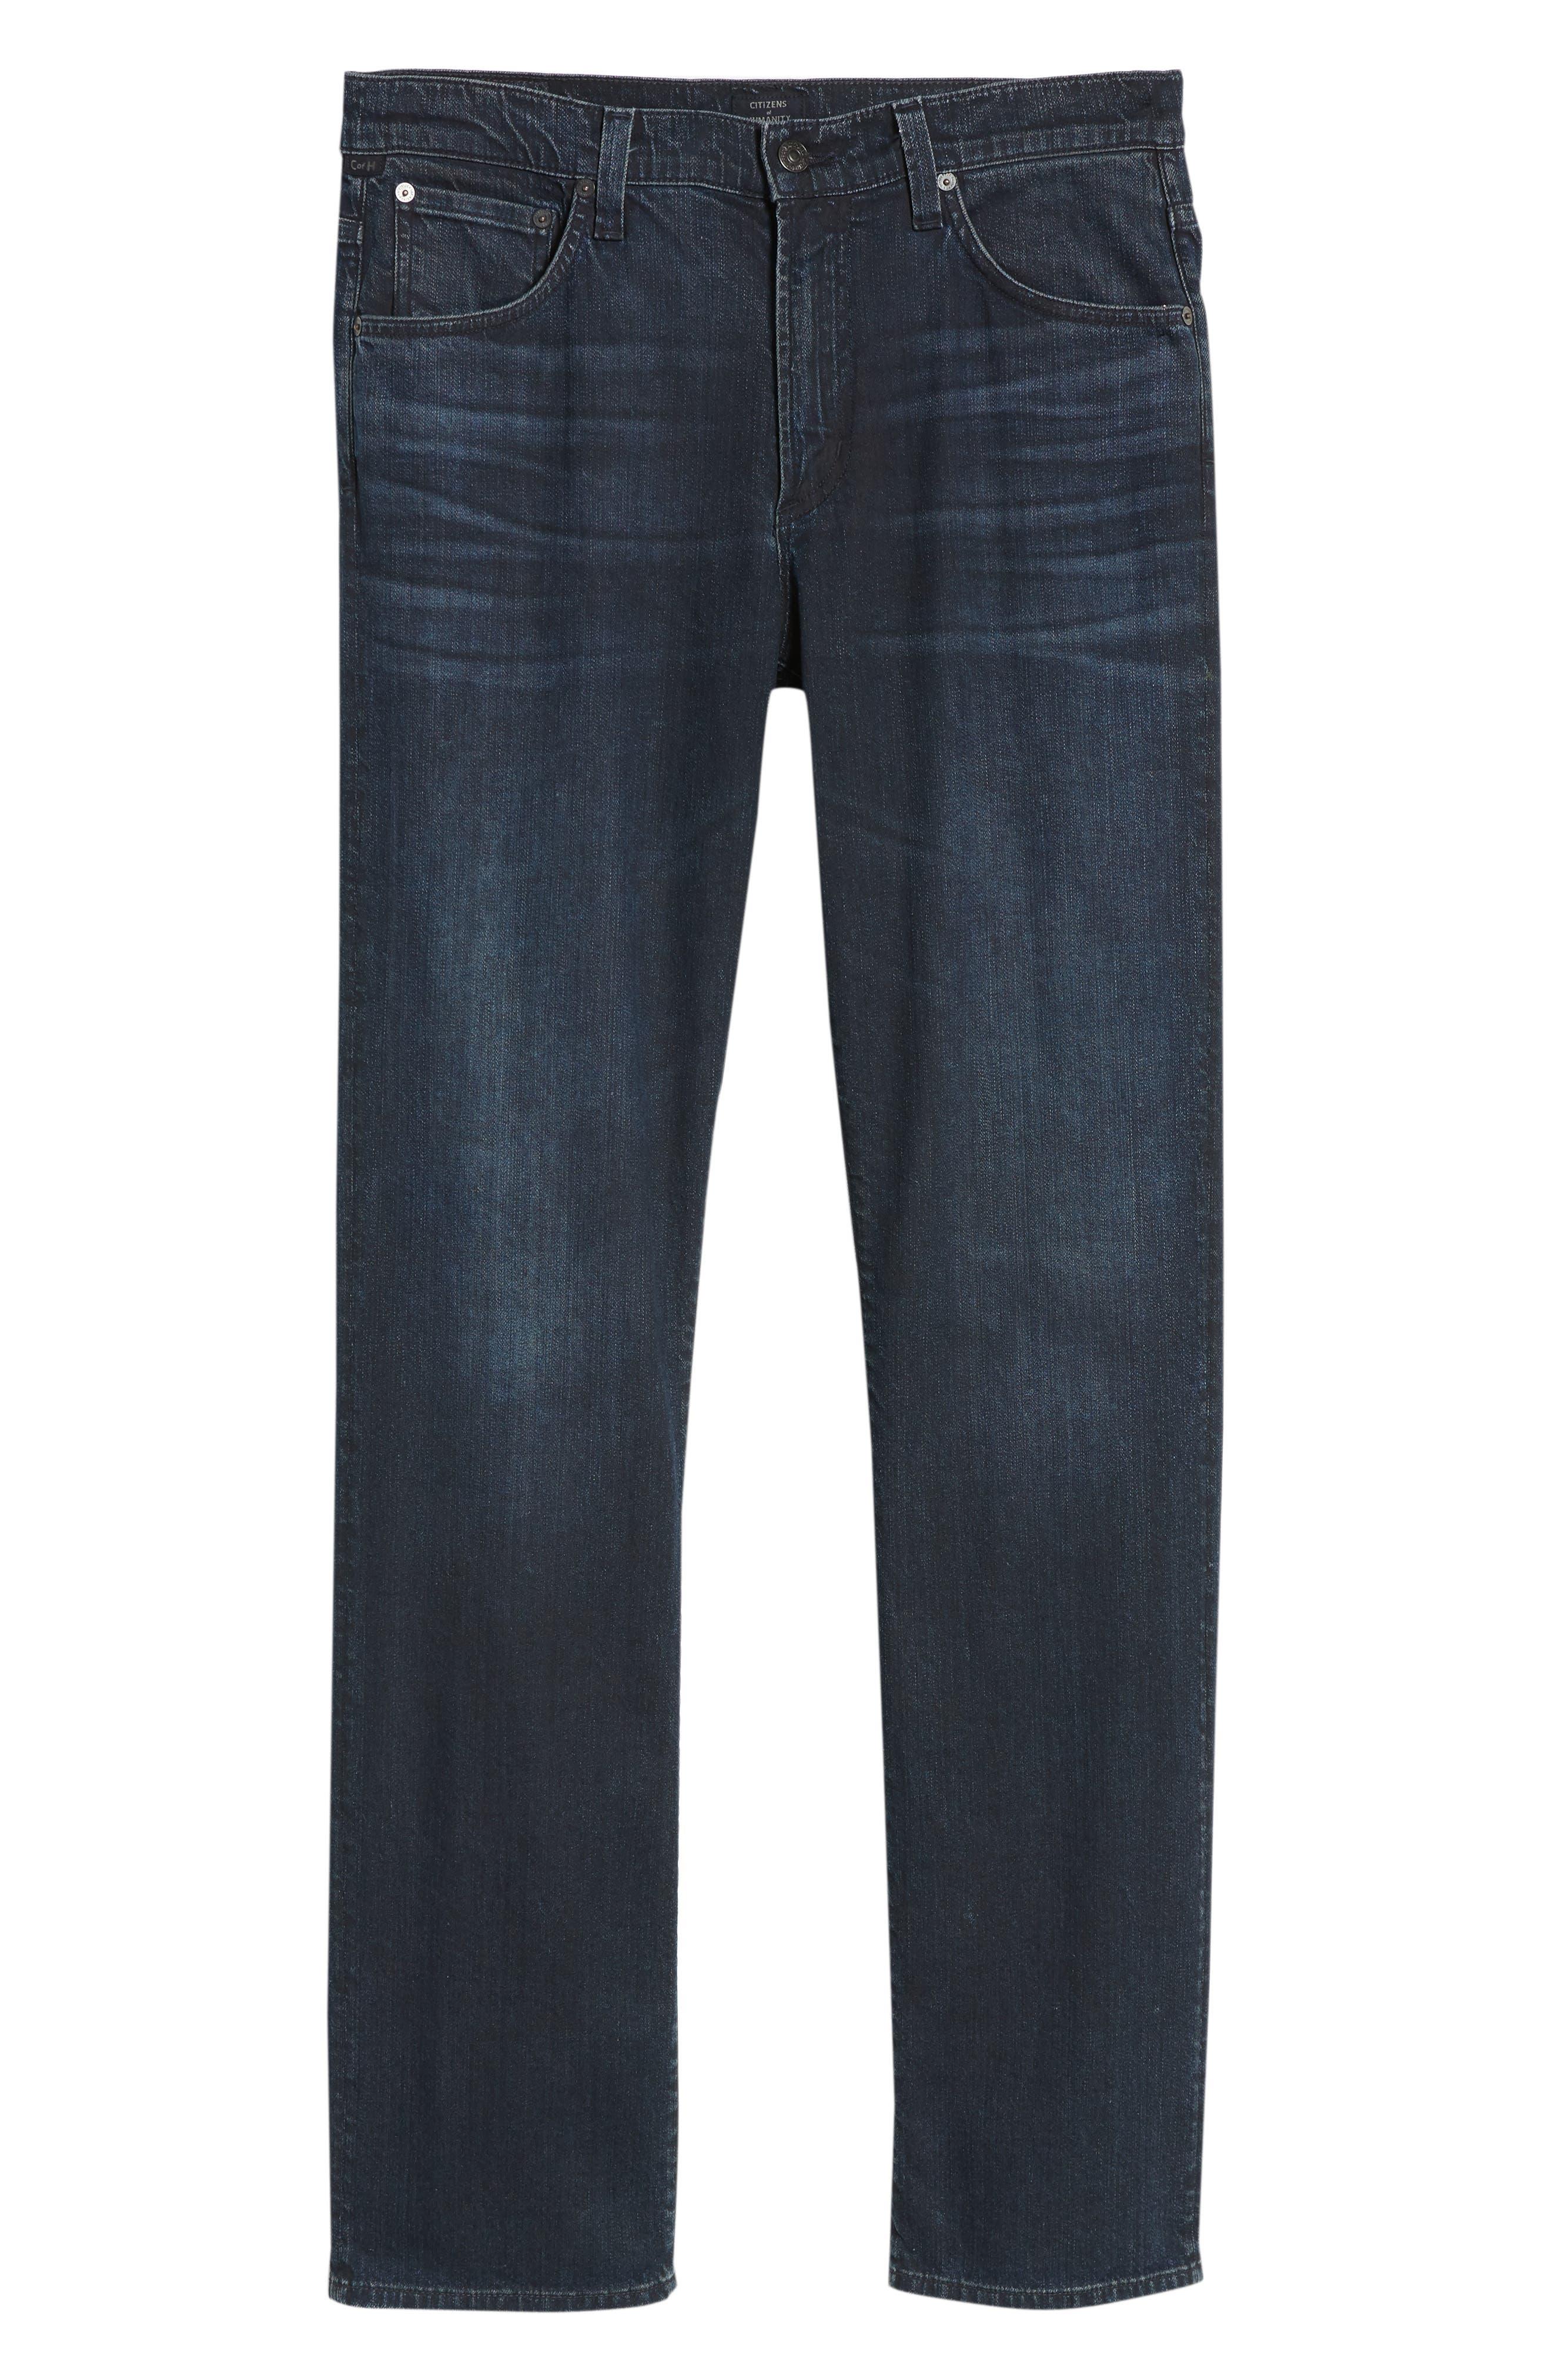 Sid Straight Leg Jeans,                             Alternate thumbnail 6, color,                             NATE